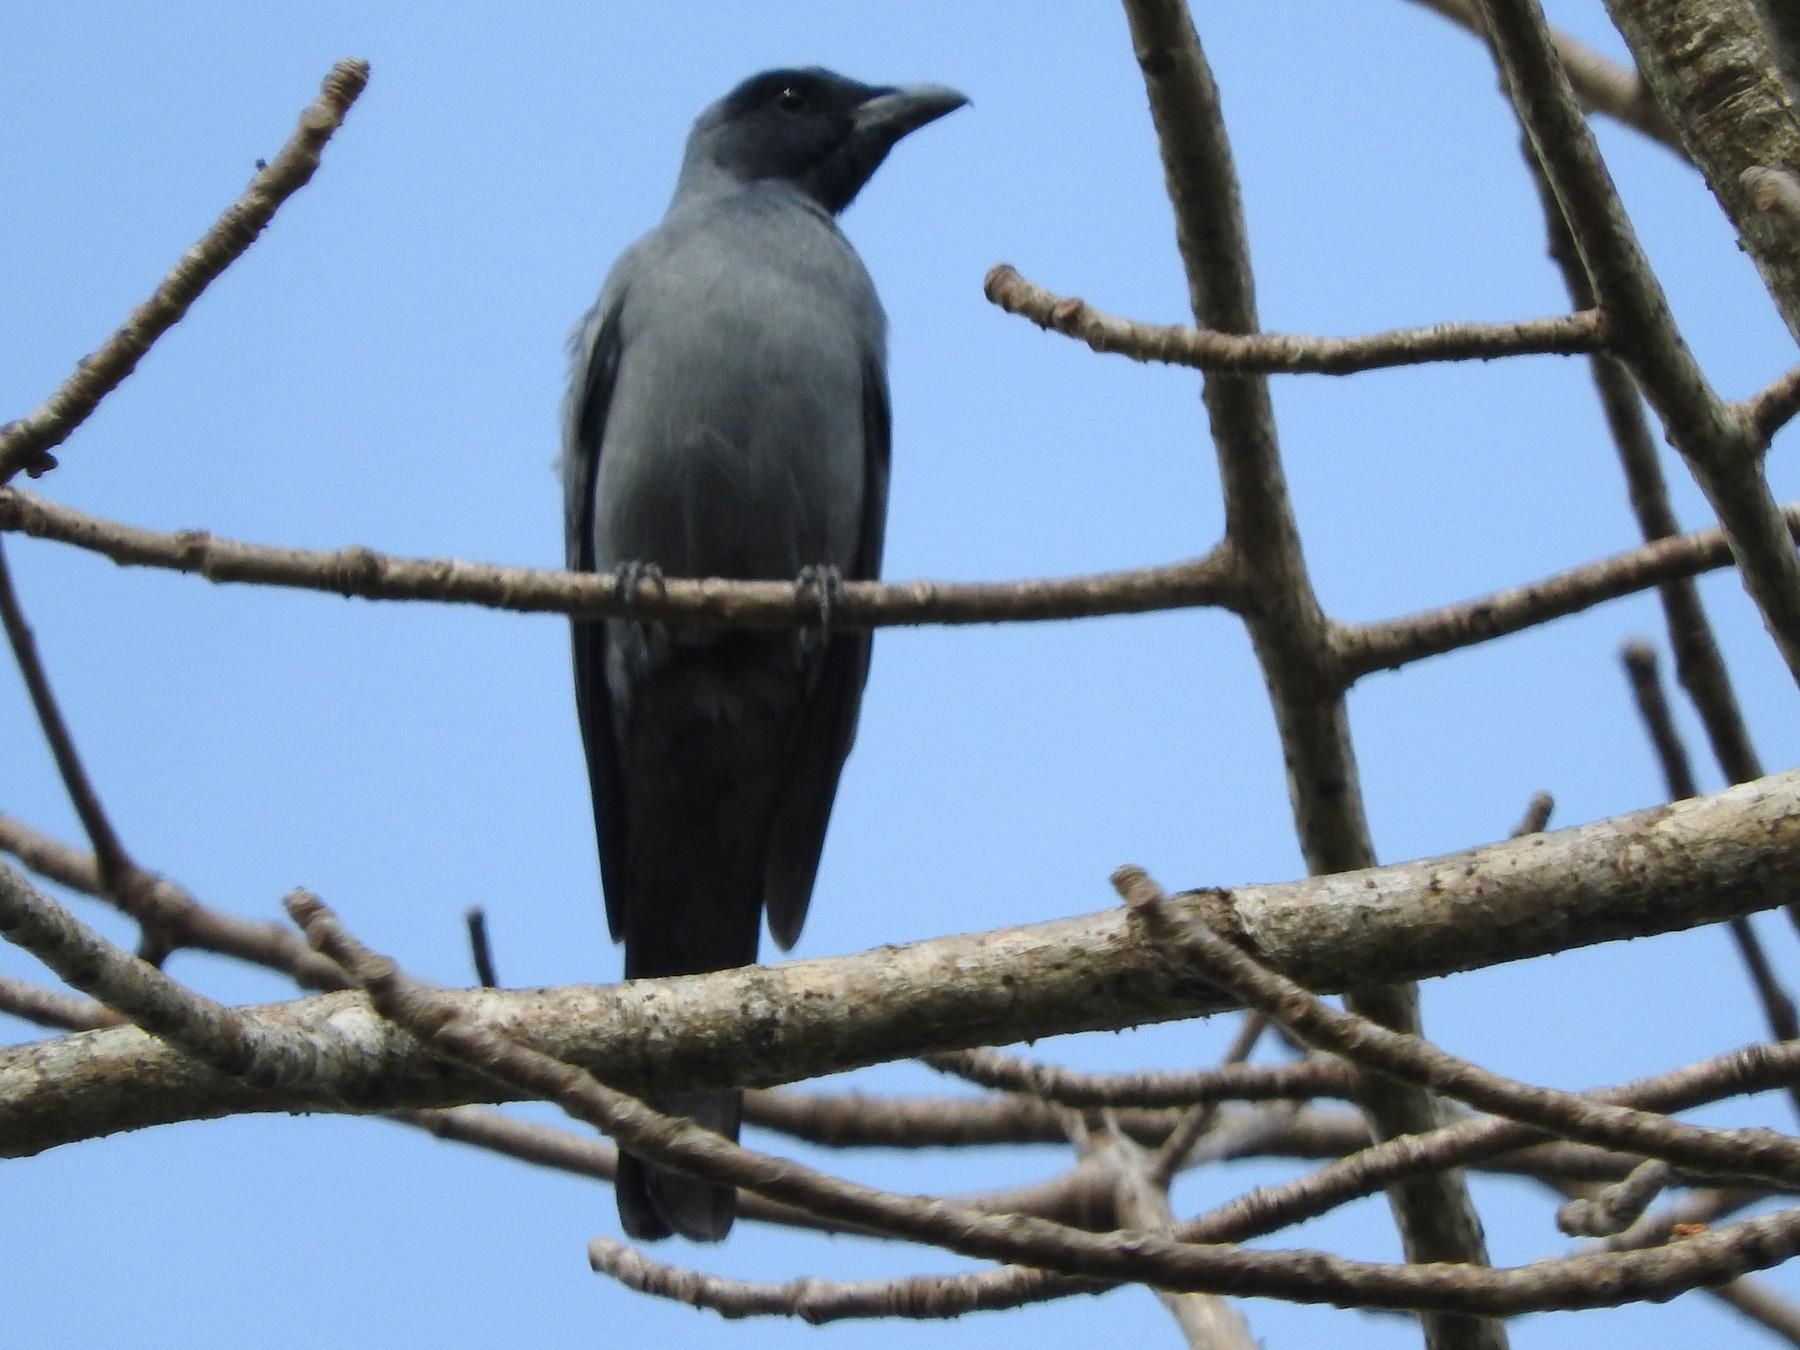 Wallacean Cuckooshrike - Sandy Gayasih